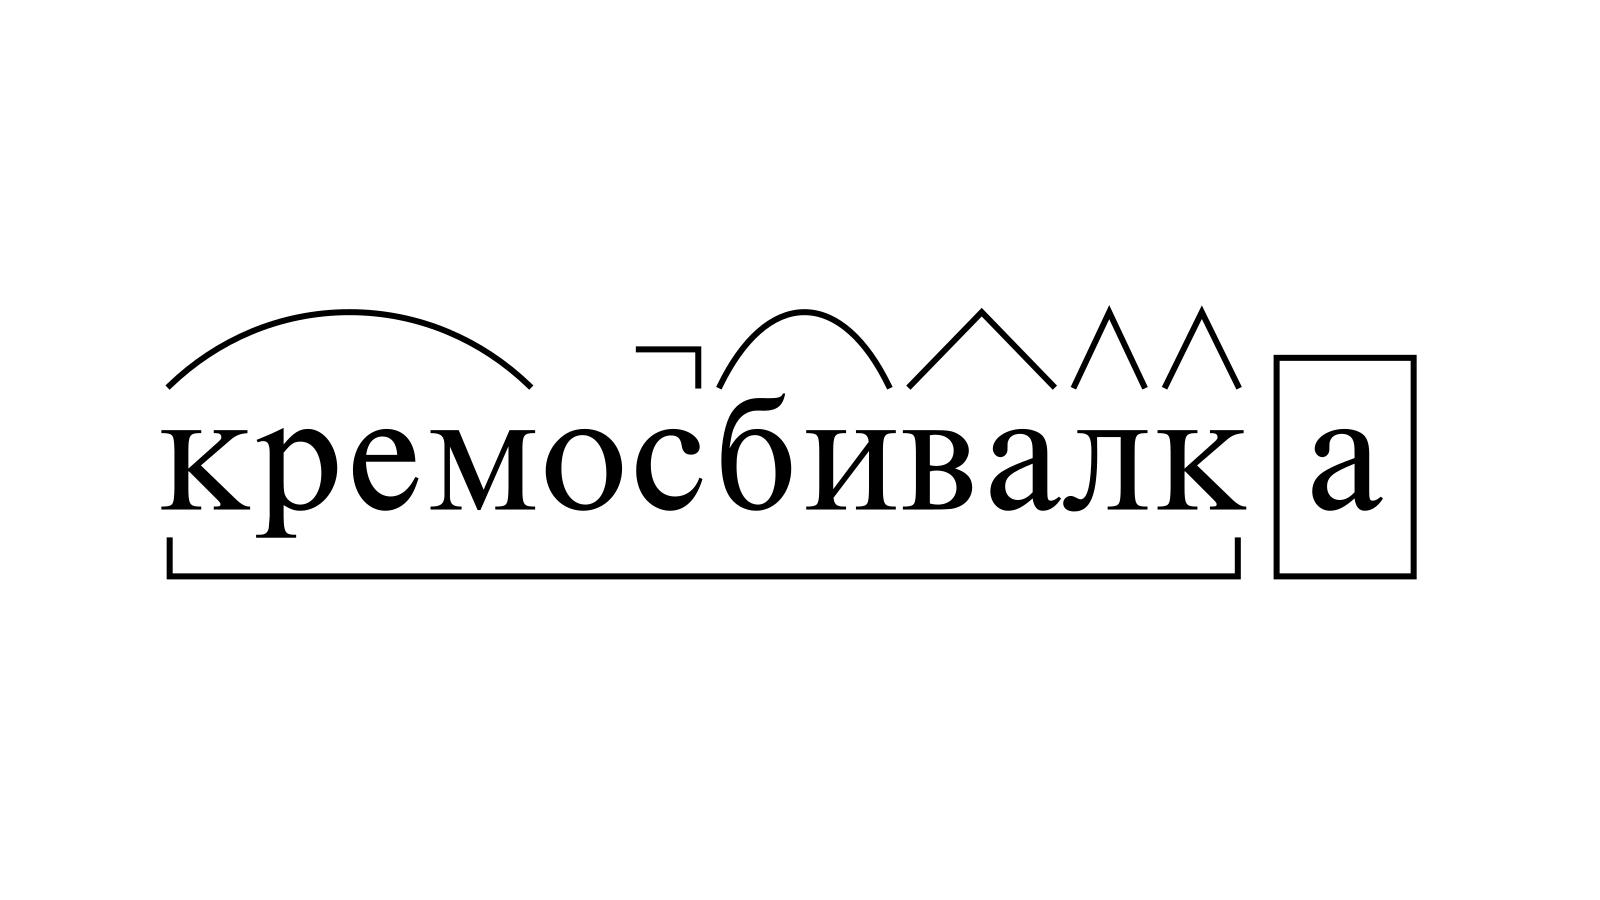 Разбор слова «кремосбивалка» по составу